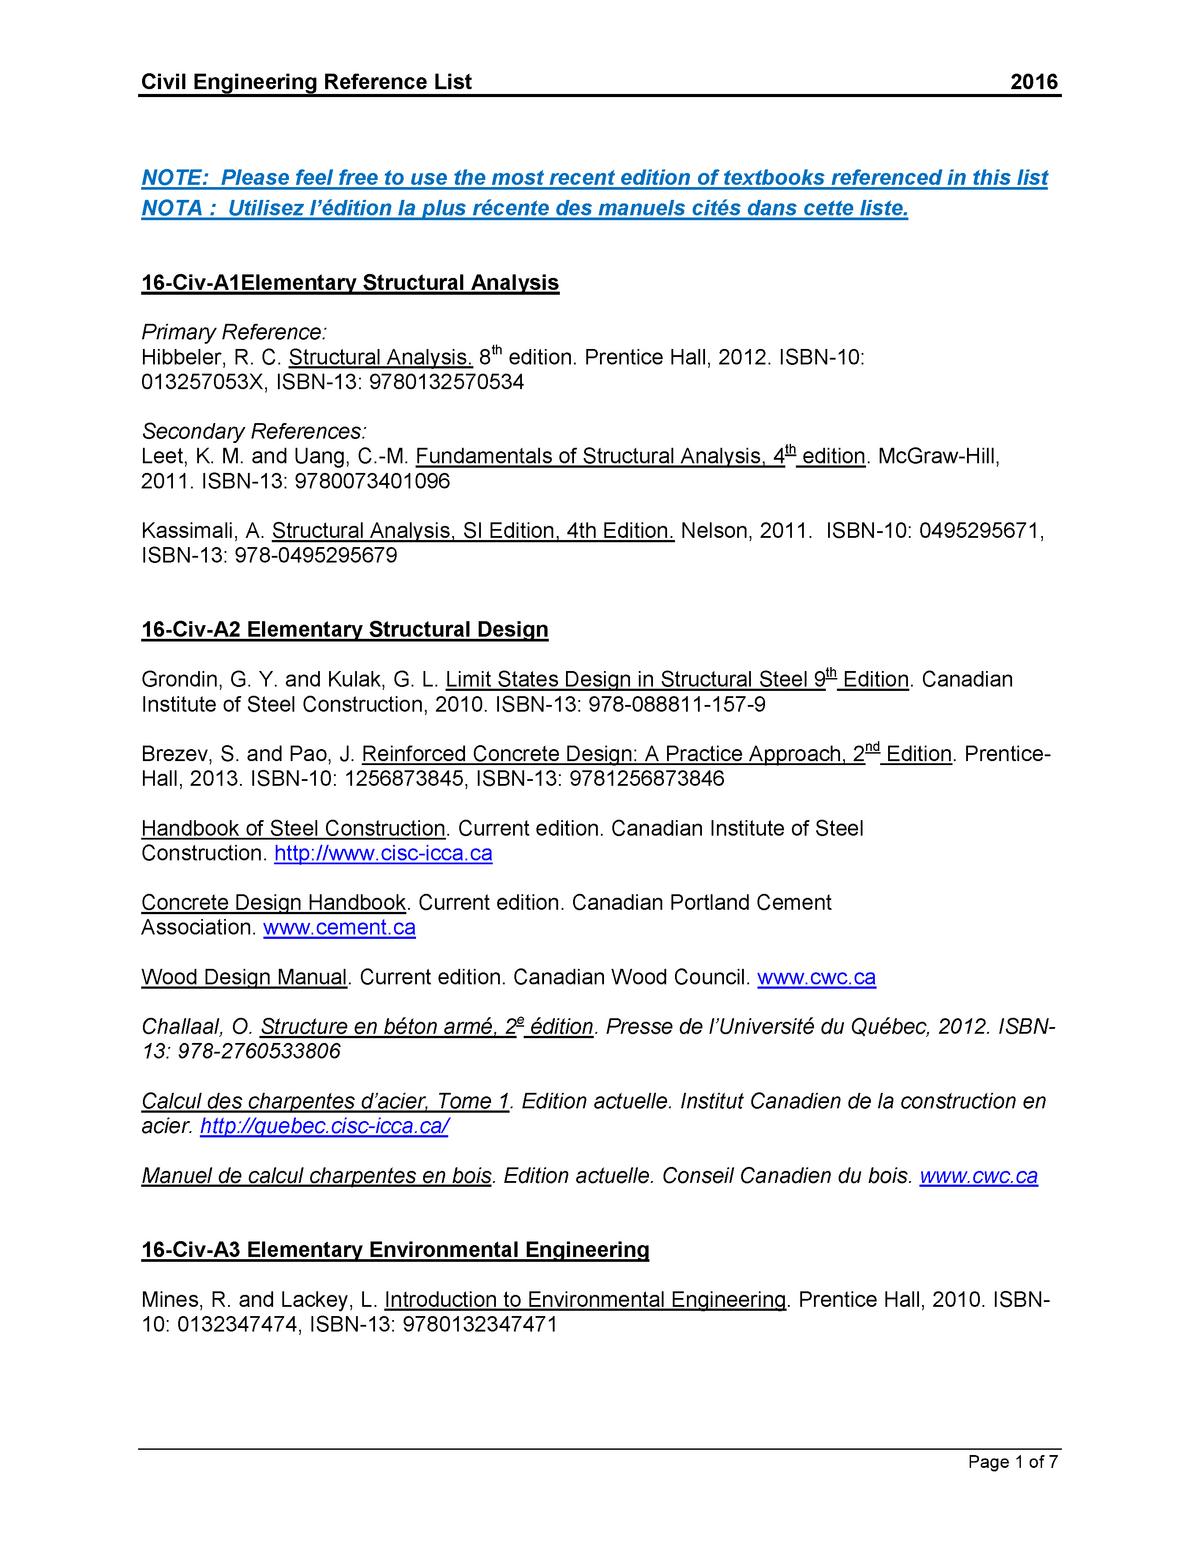 Civil reference textbooks - Ce 212 3 - U of S - StuDocu